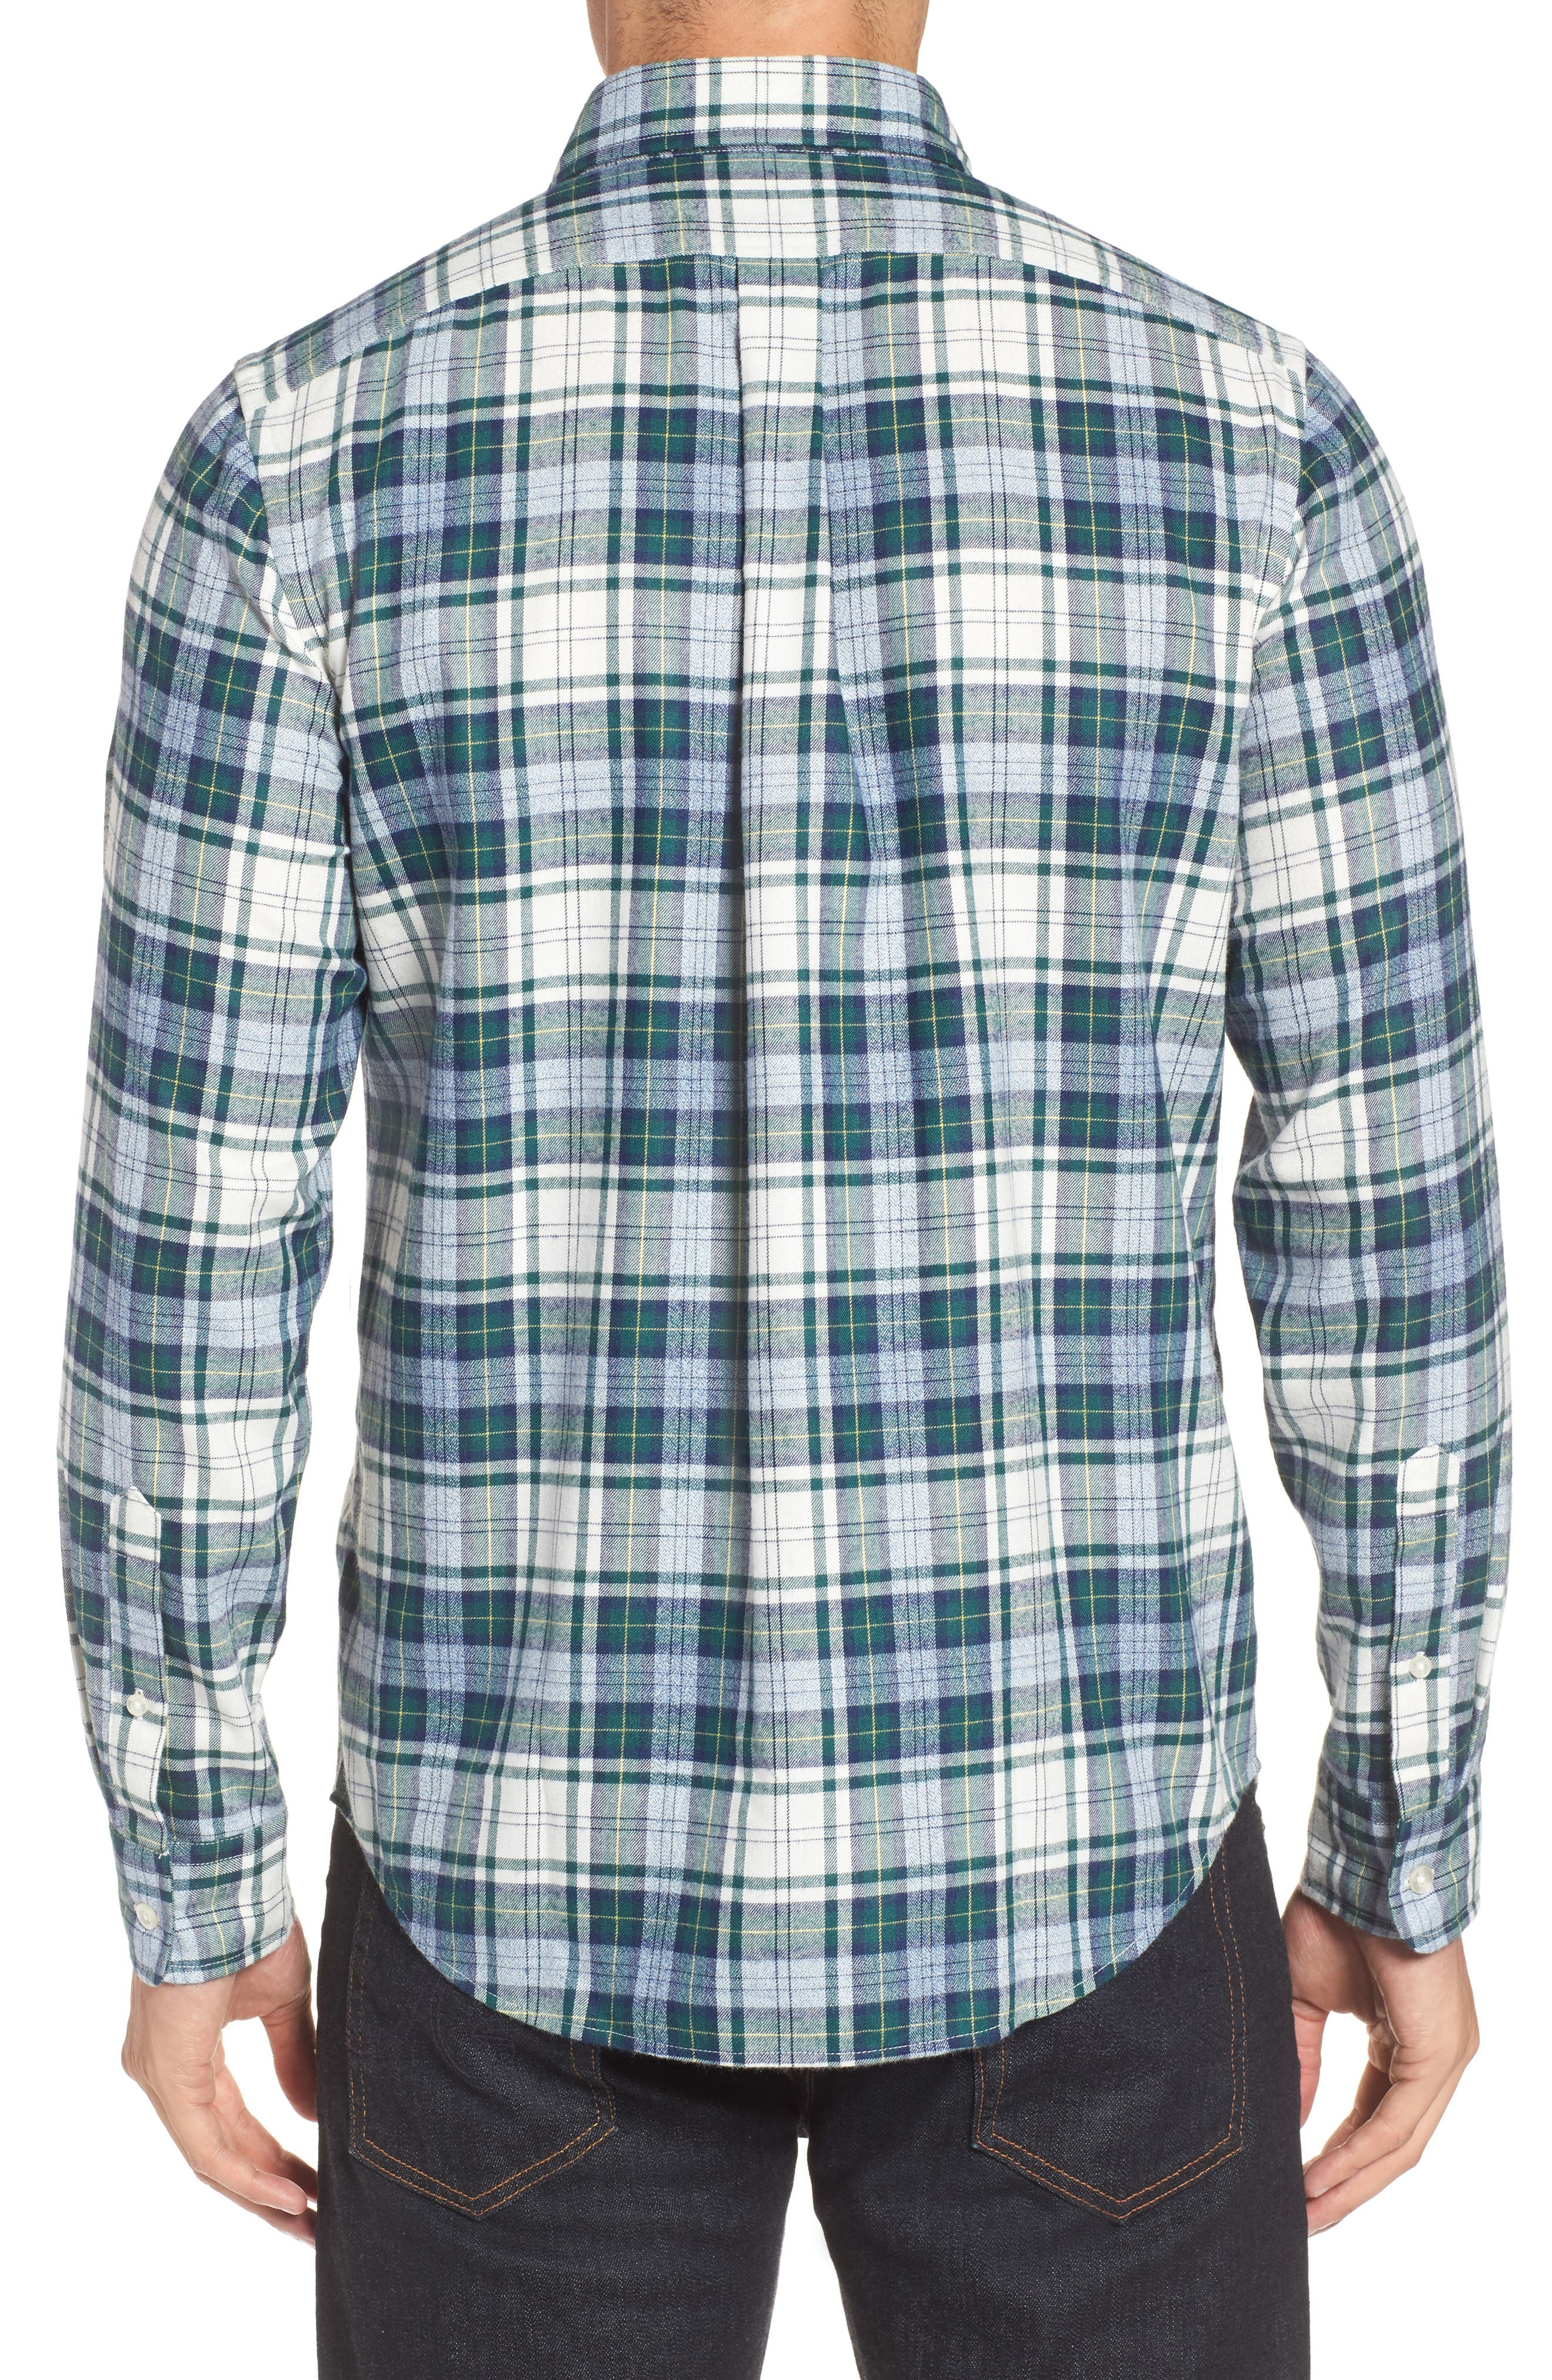 Tucker Hayward Point Slim Fit Plaid Sport Shirt,                             Alternate thumbnail 2, color,                             Charleston Green